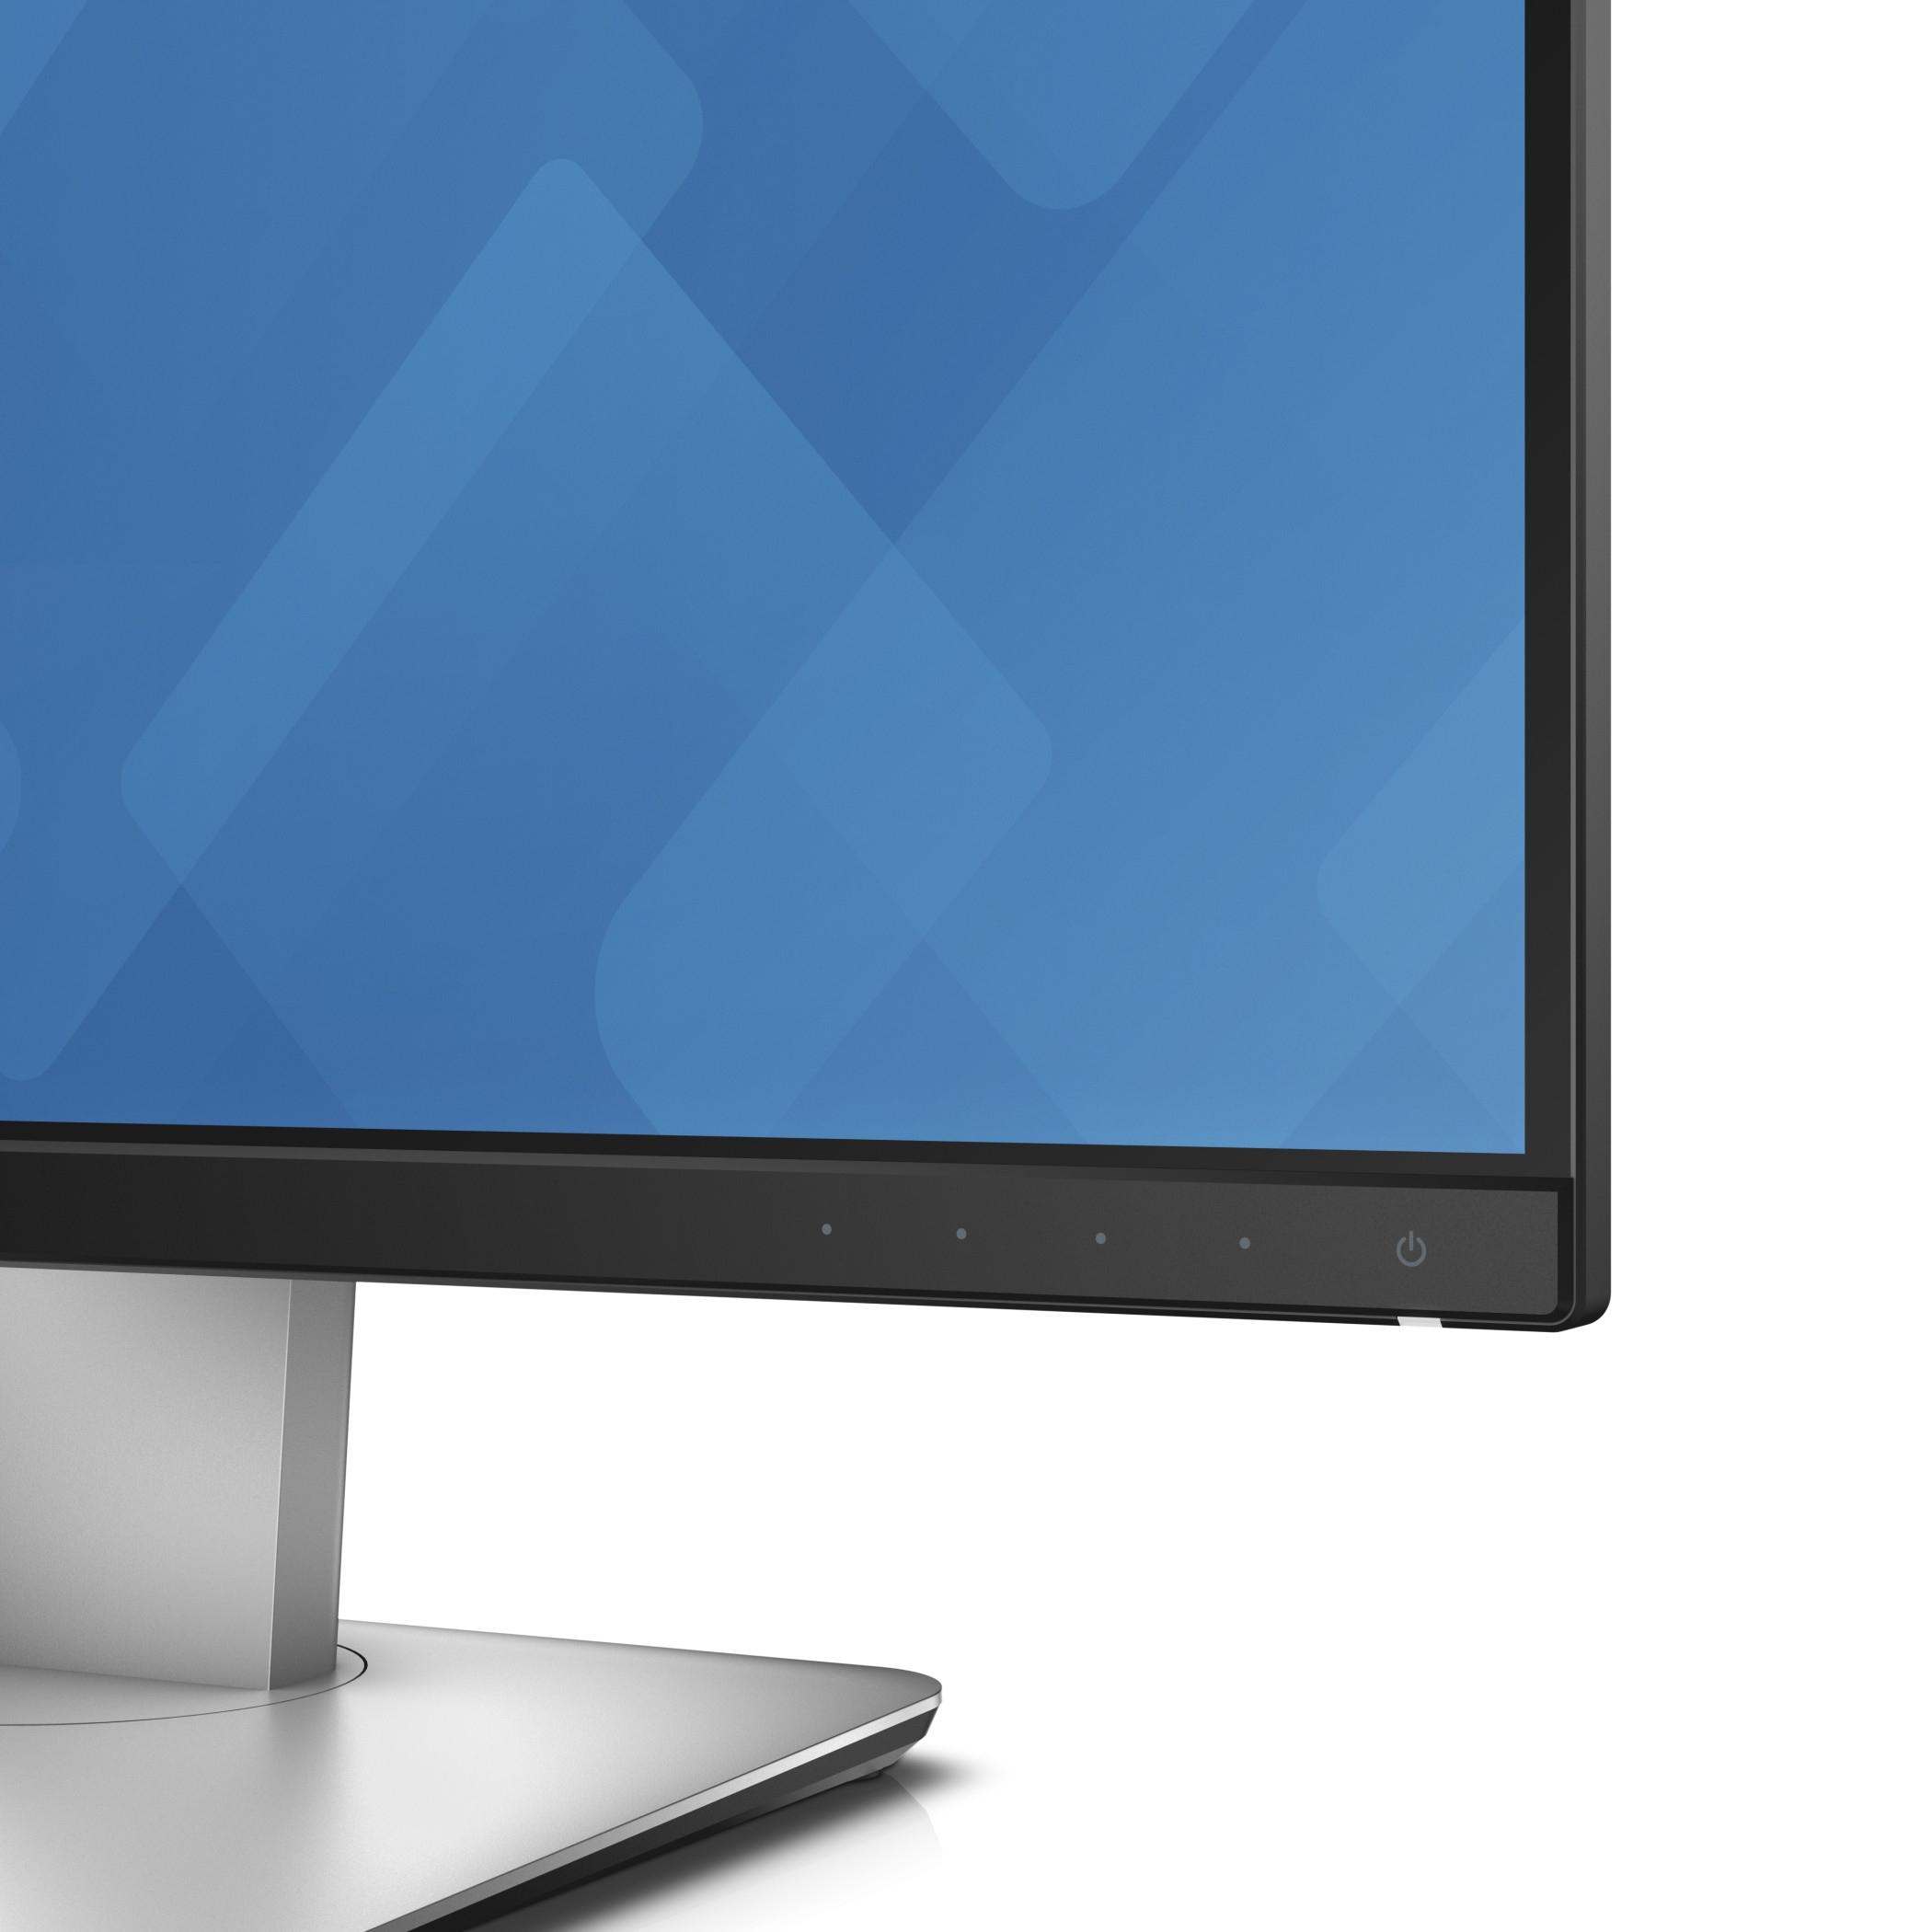 Dell Ultrasharp U2415 Ips 24 1 Black Silver Full Hd Matt